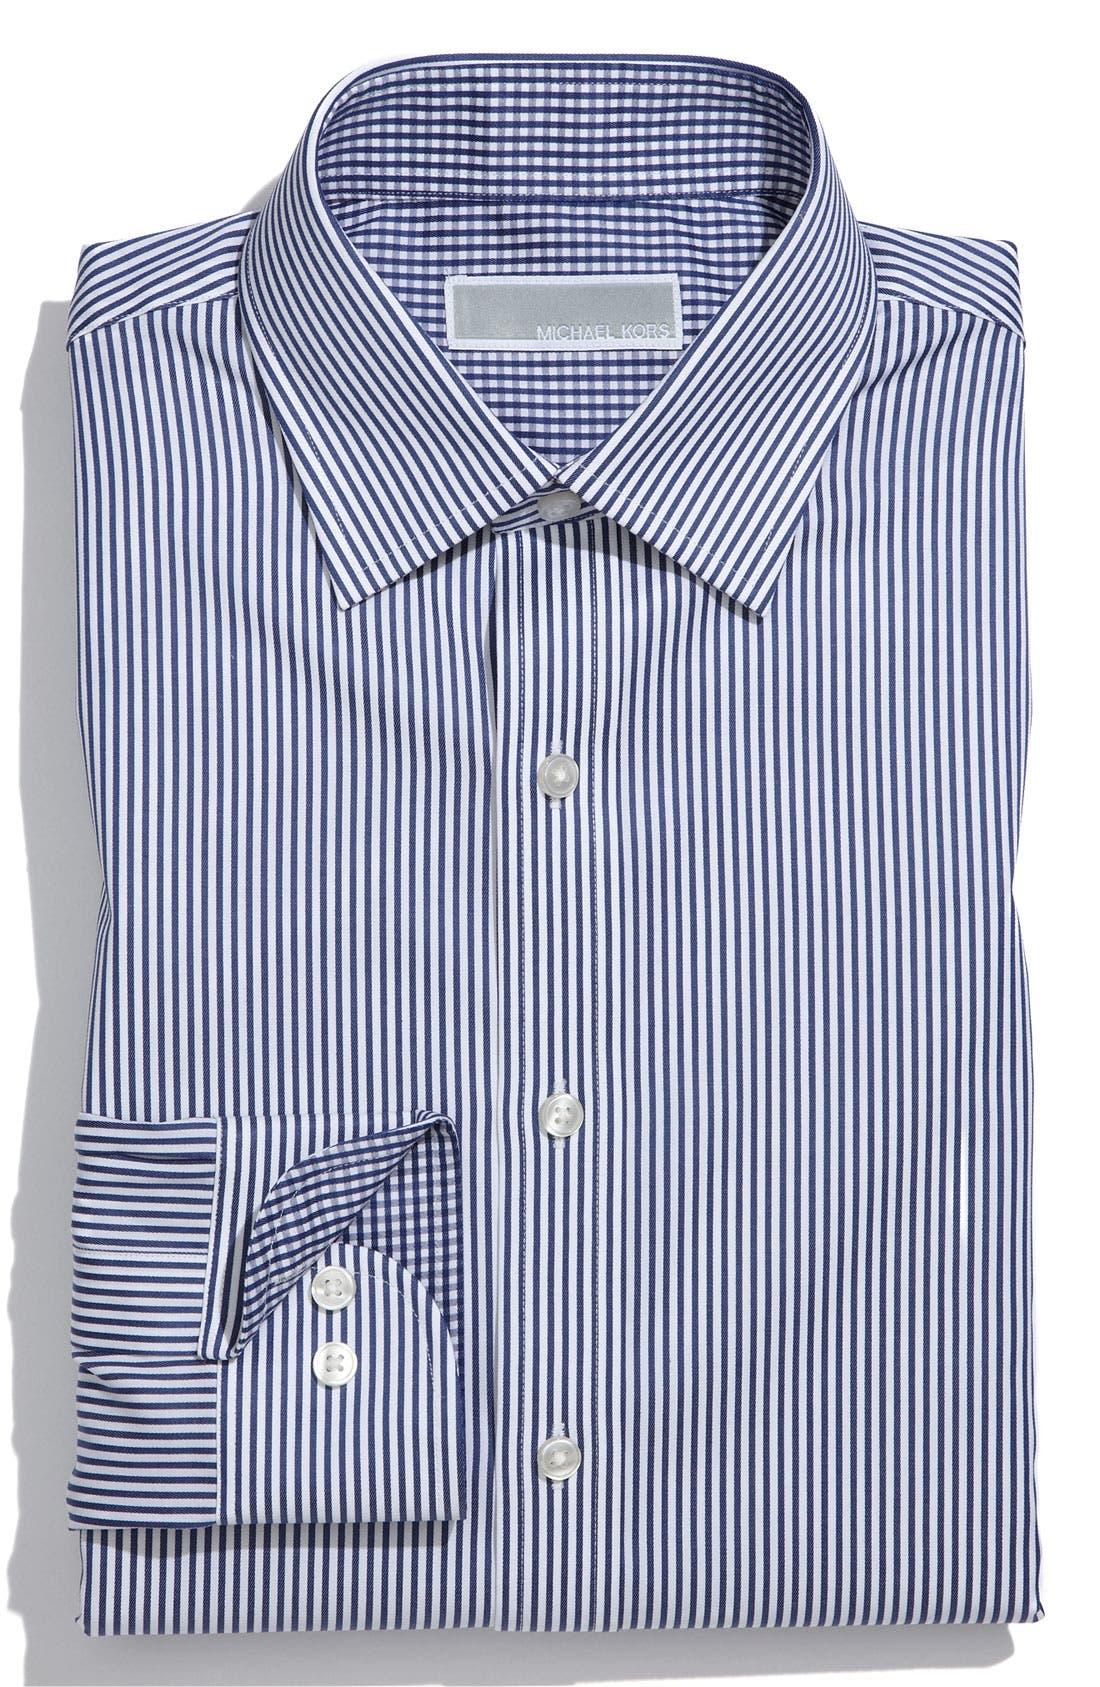 Regular Fit Dress Shirt, Main, color, 415